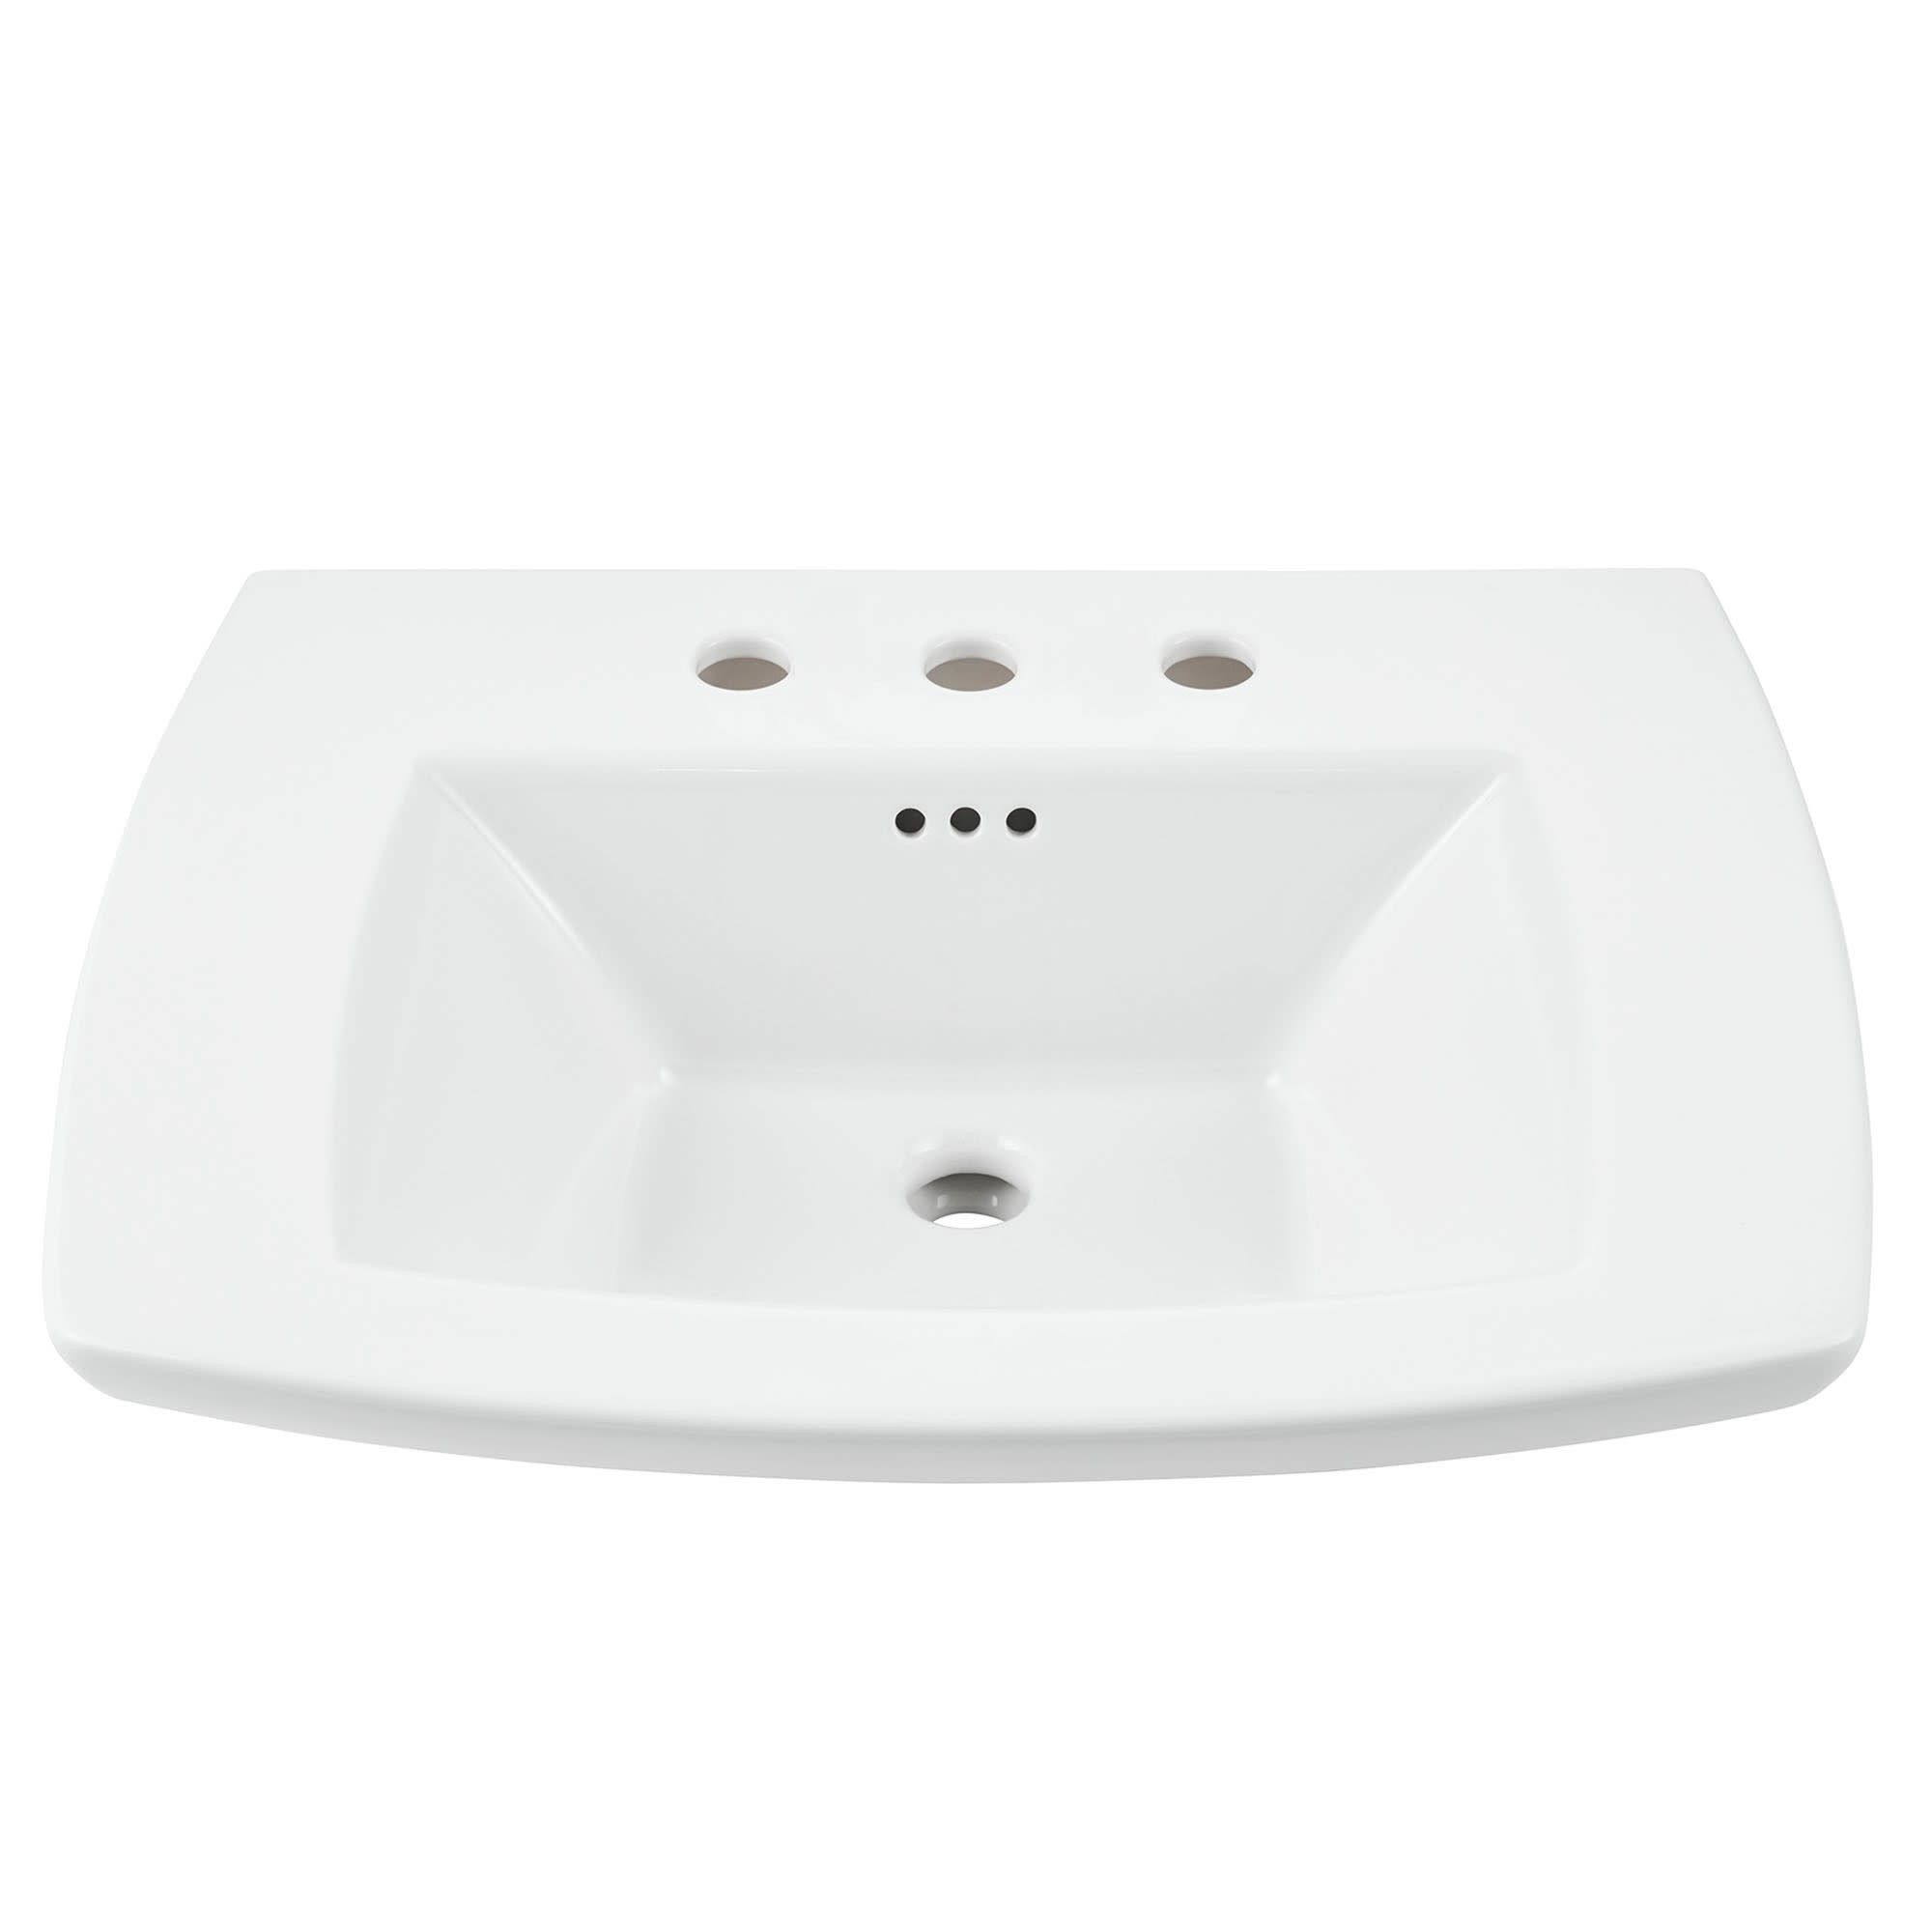 American Standard 445 008 Edgemere 25 Fireclay Pedestal Bathroom